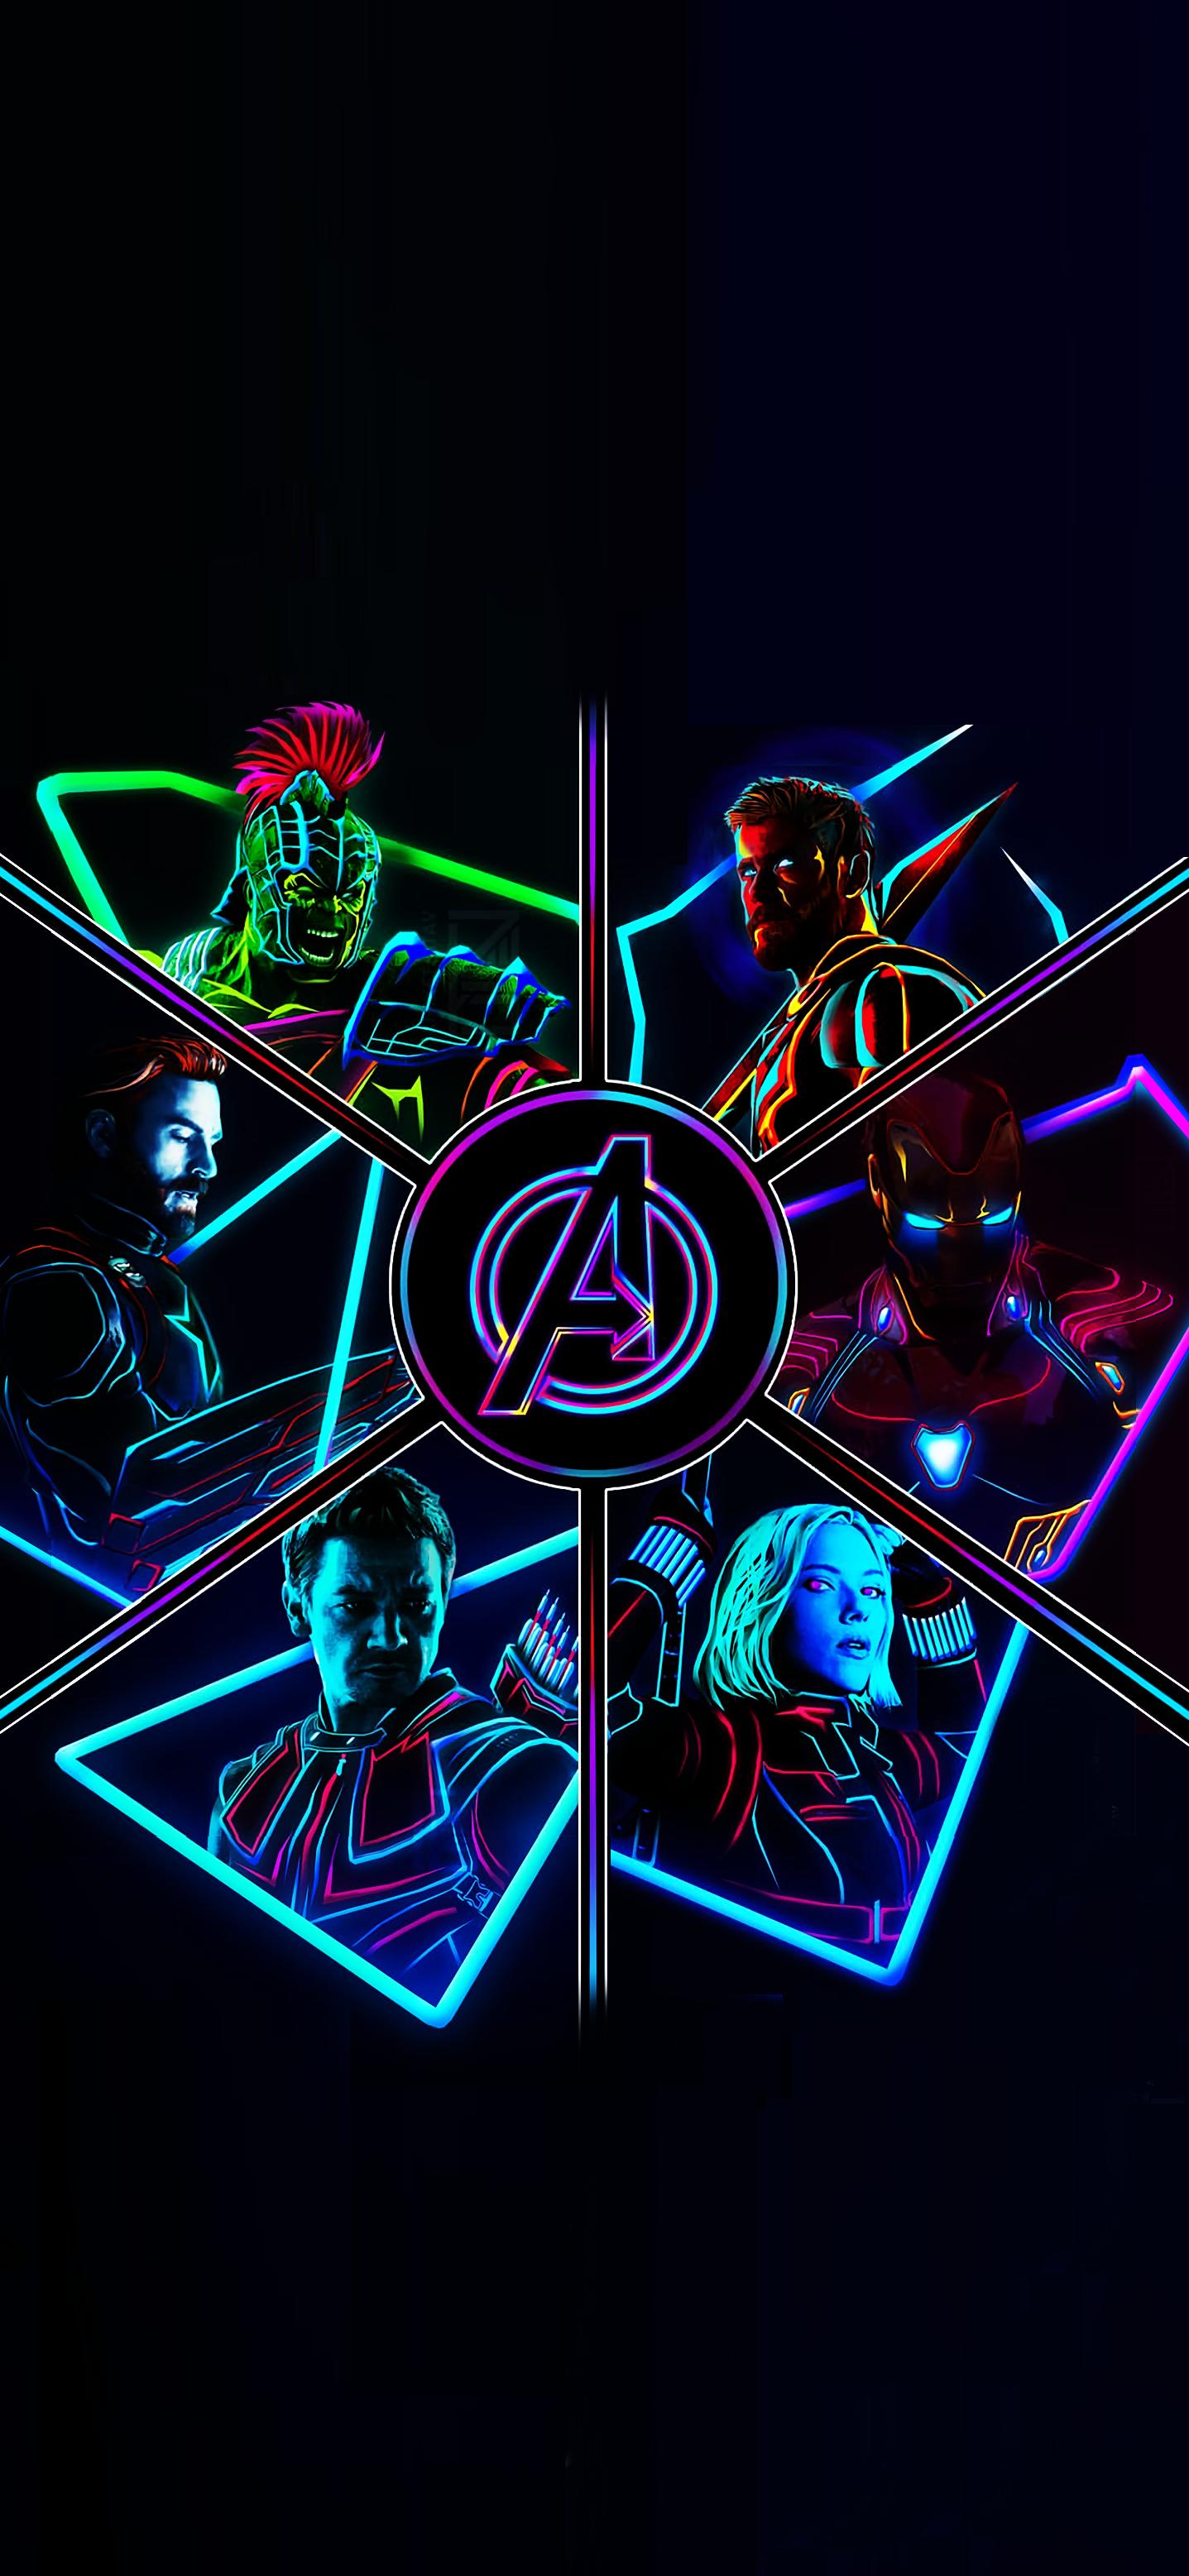 5000 Wallpaper Avengers Pinterest HD Gratis